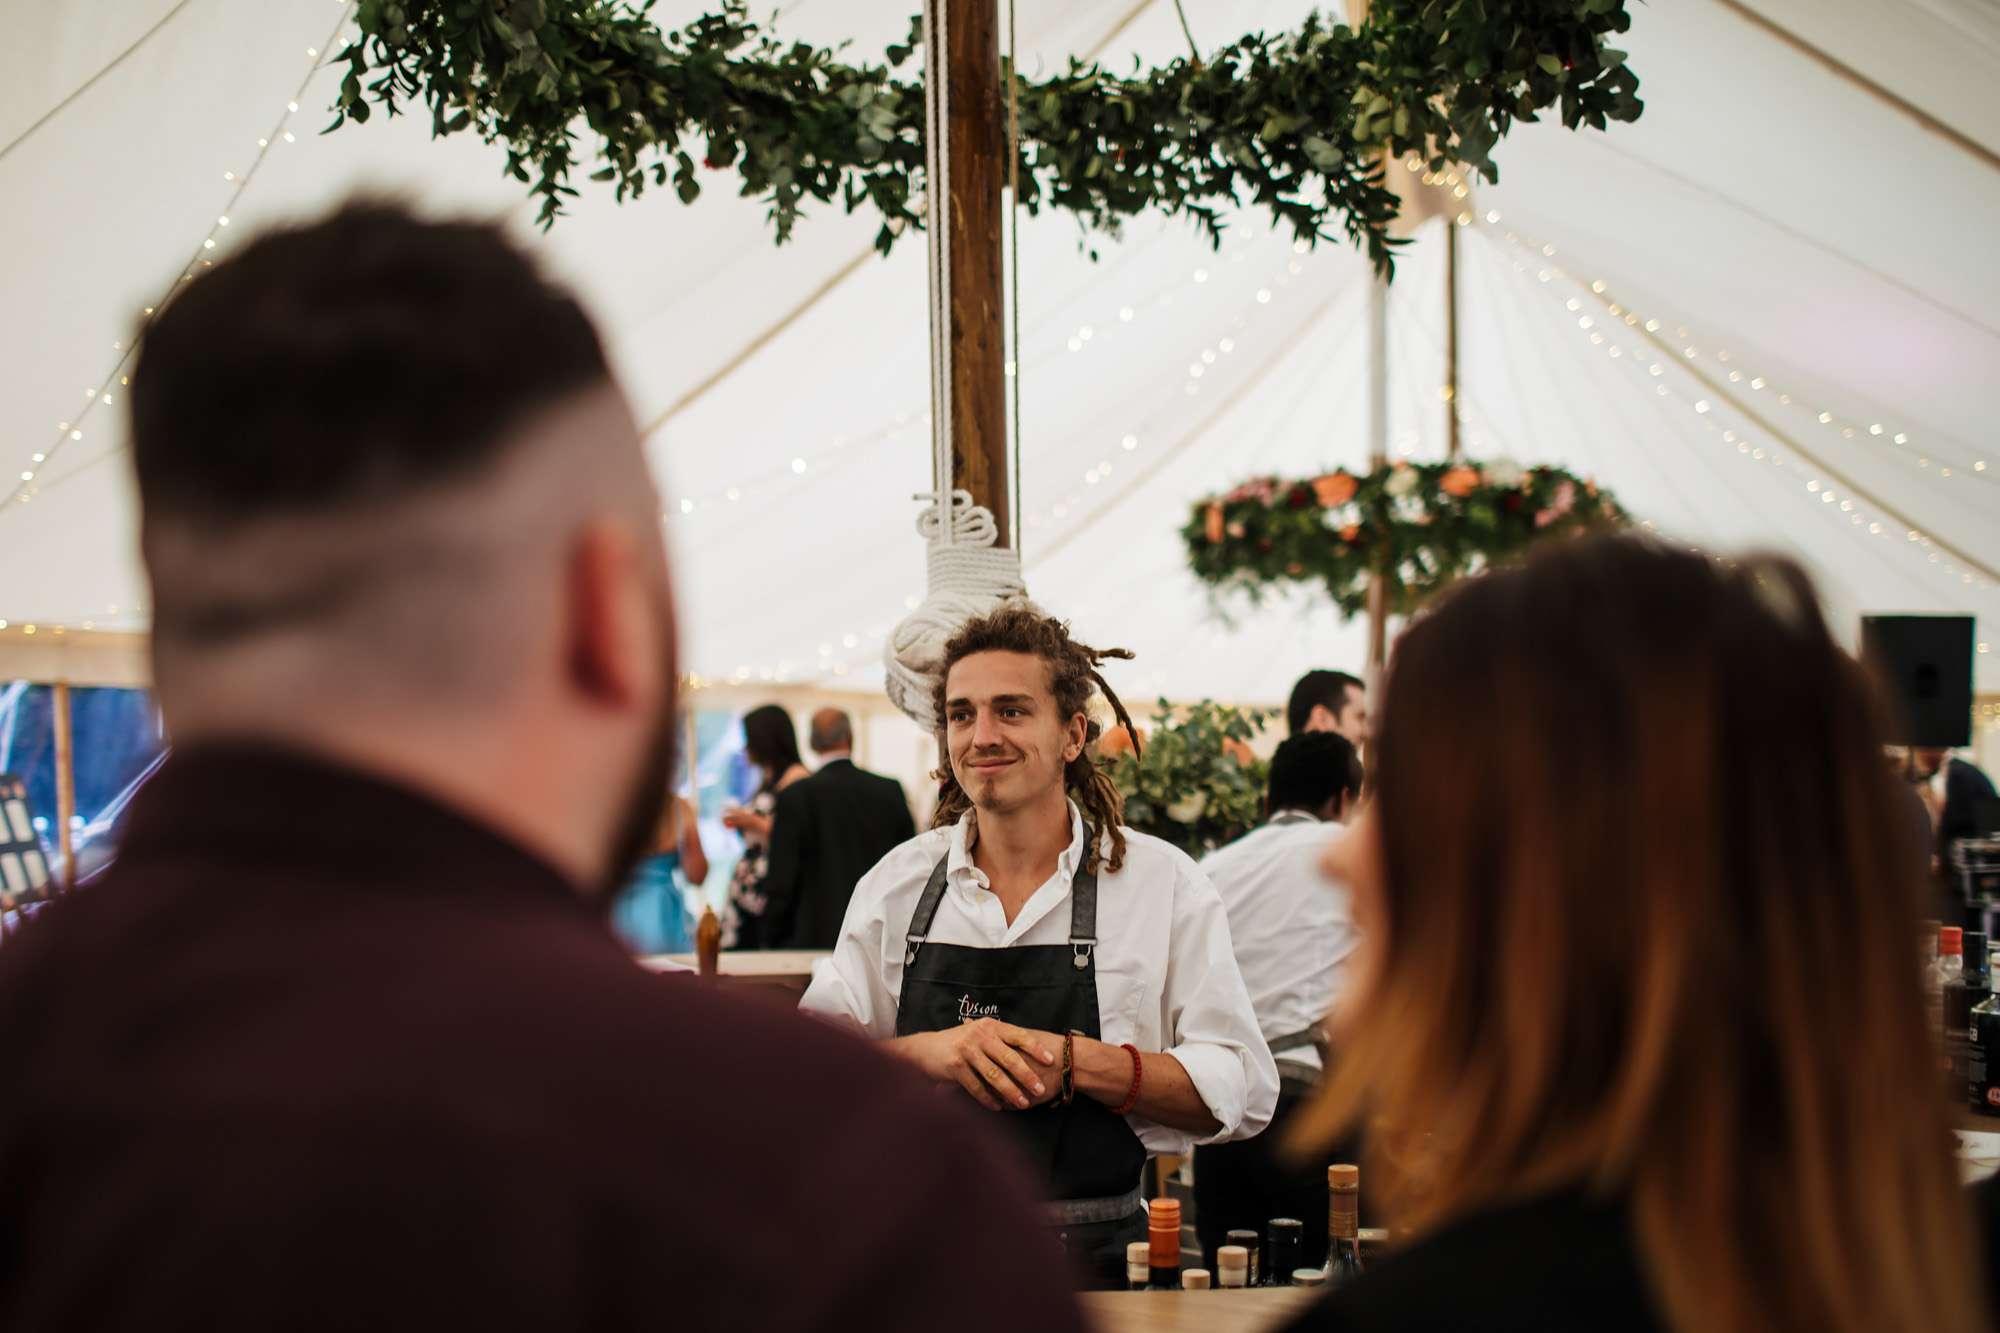 Barman working at a wedding at Fixby Hall